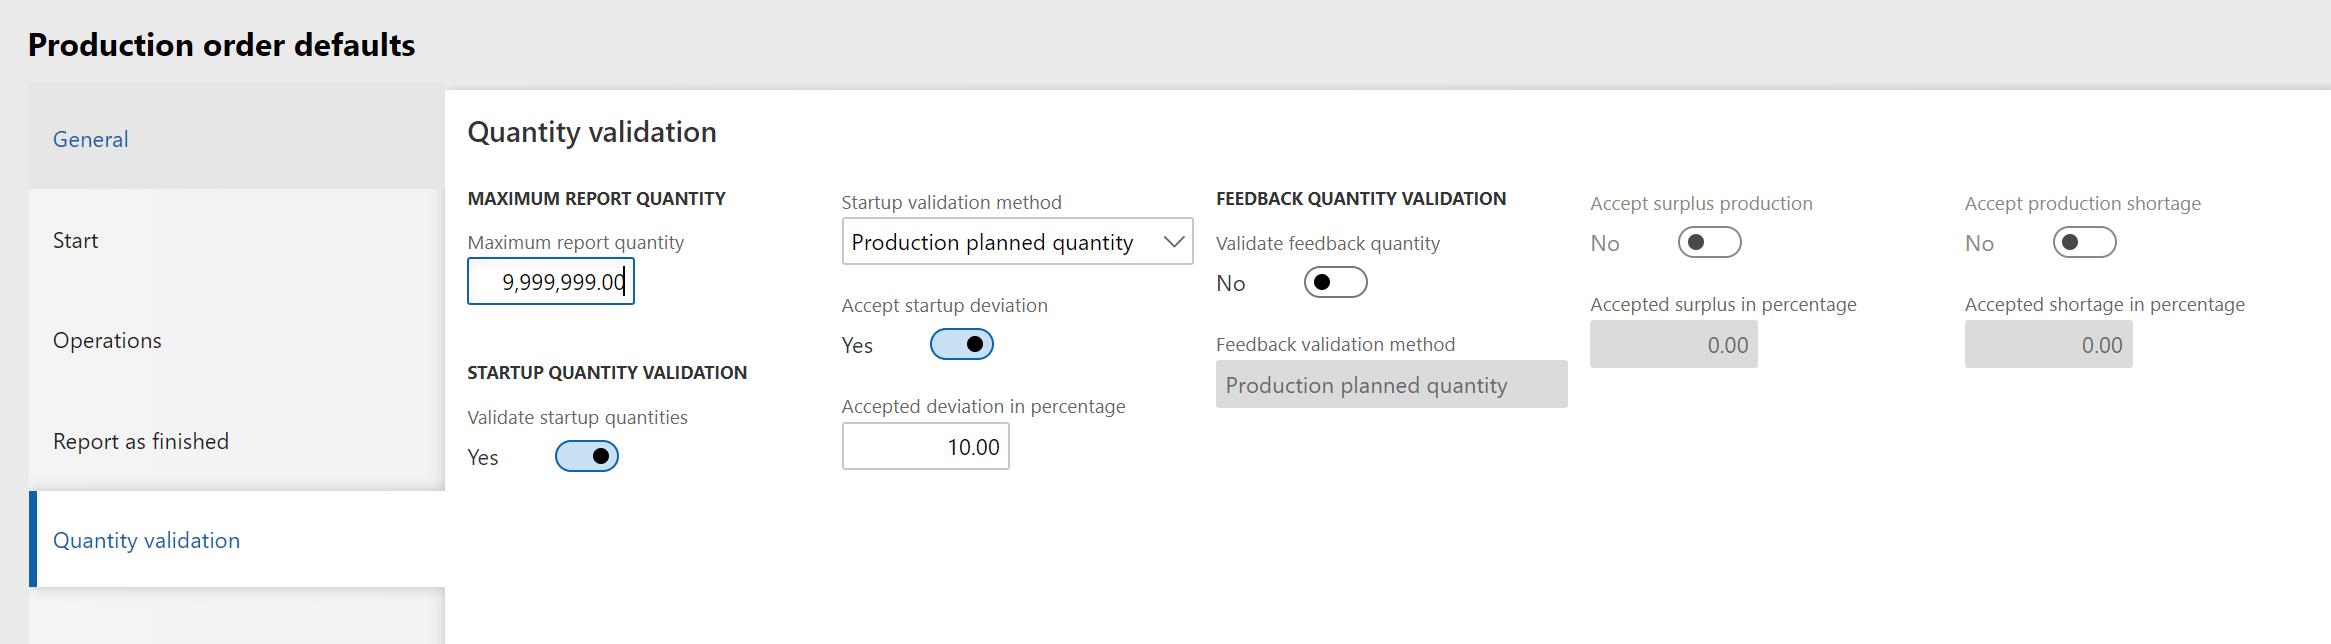 Advanced Warehousing manufacturing execution